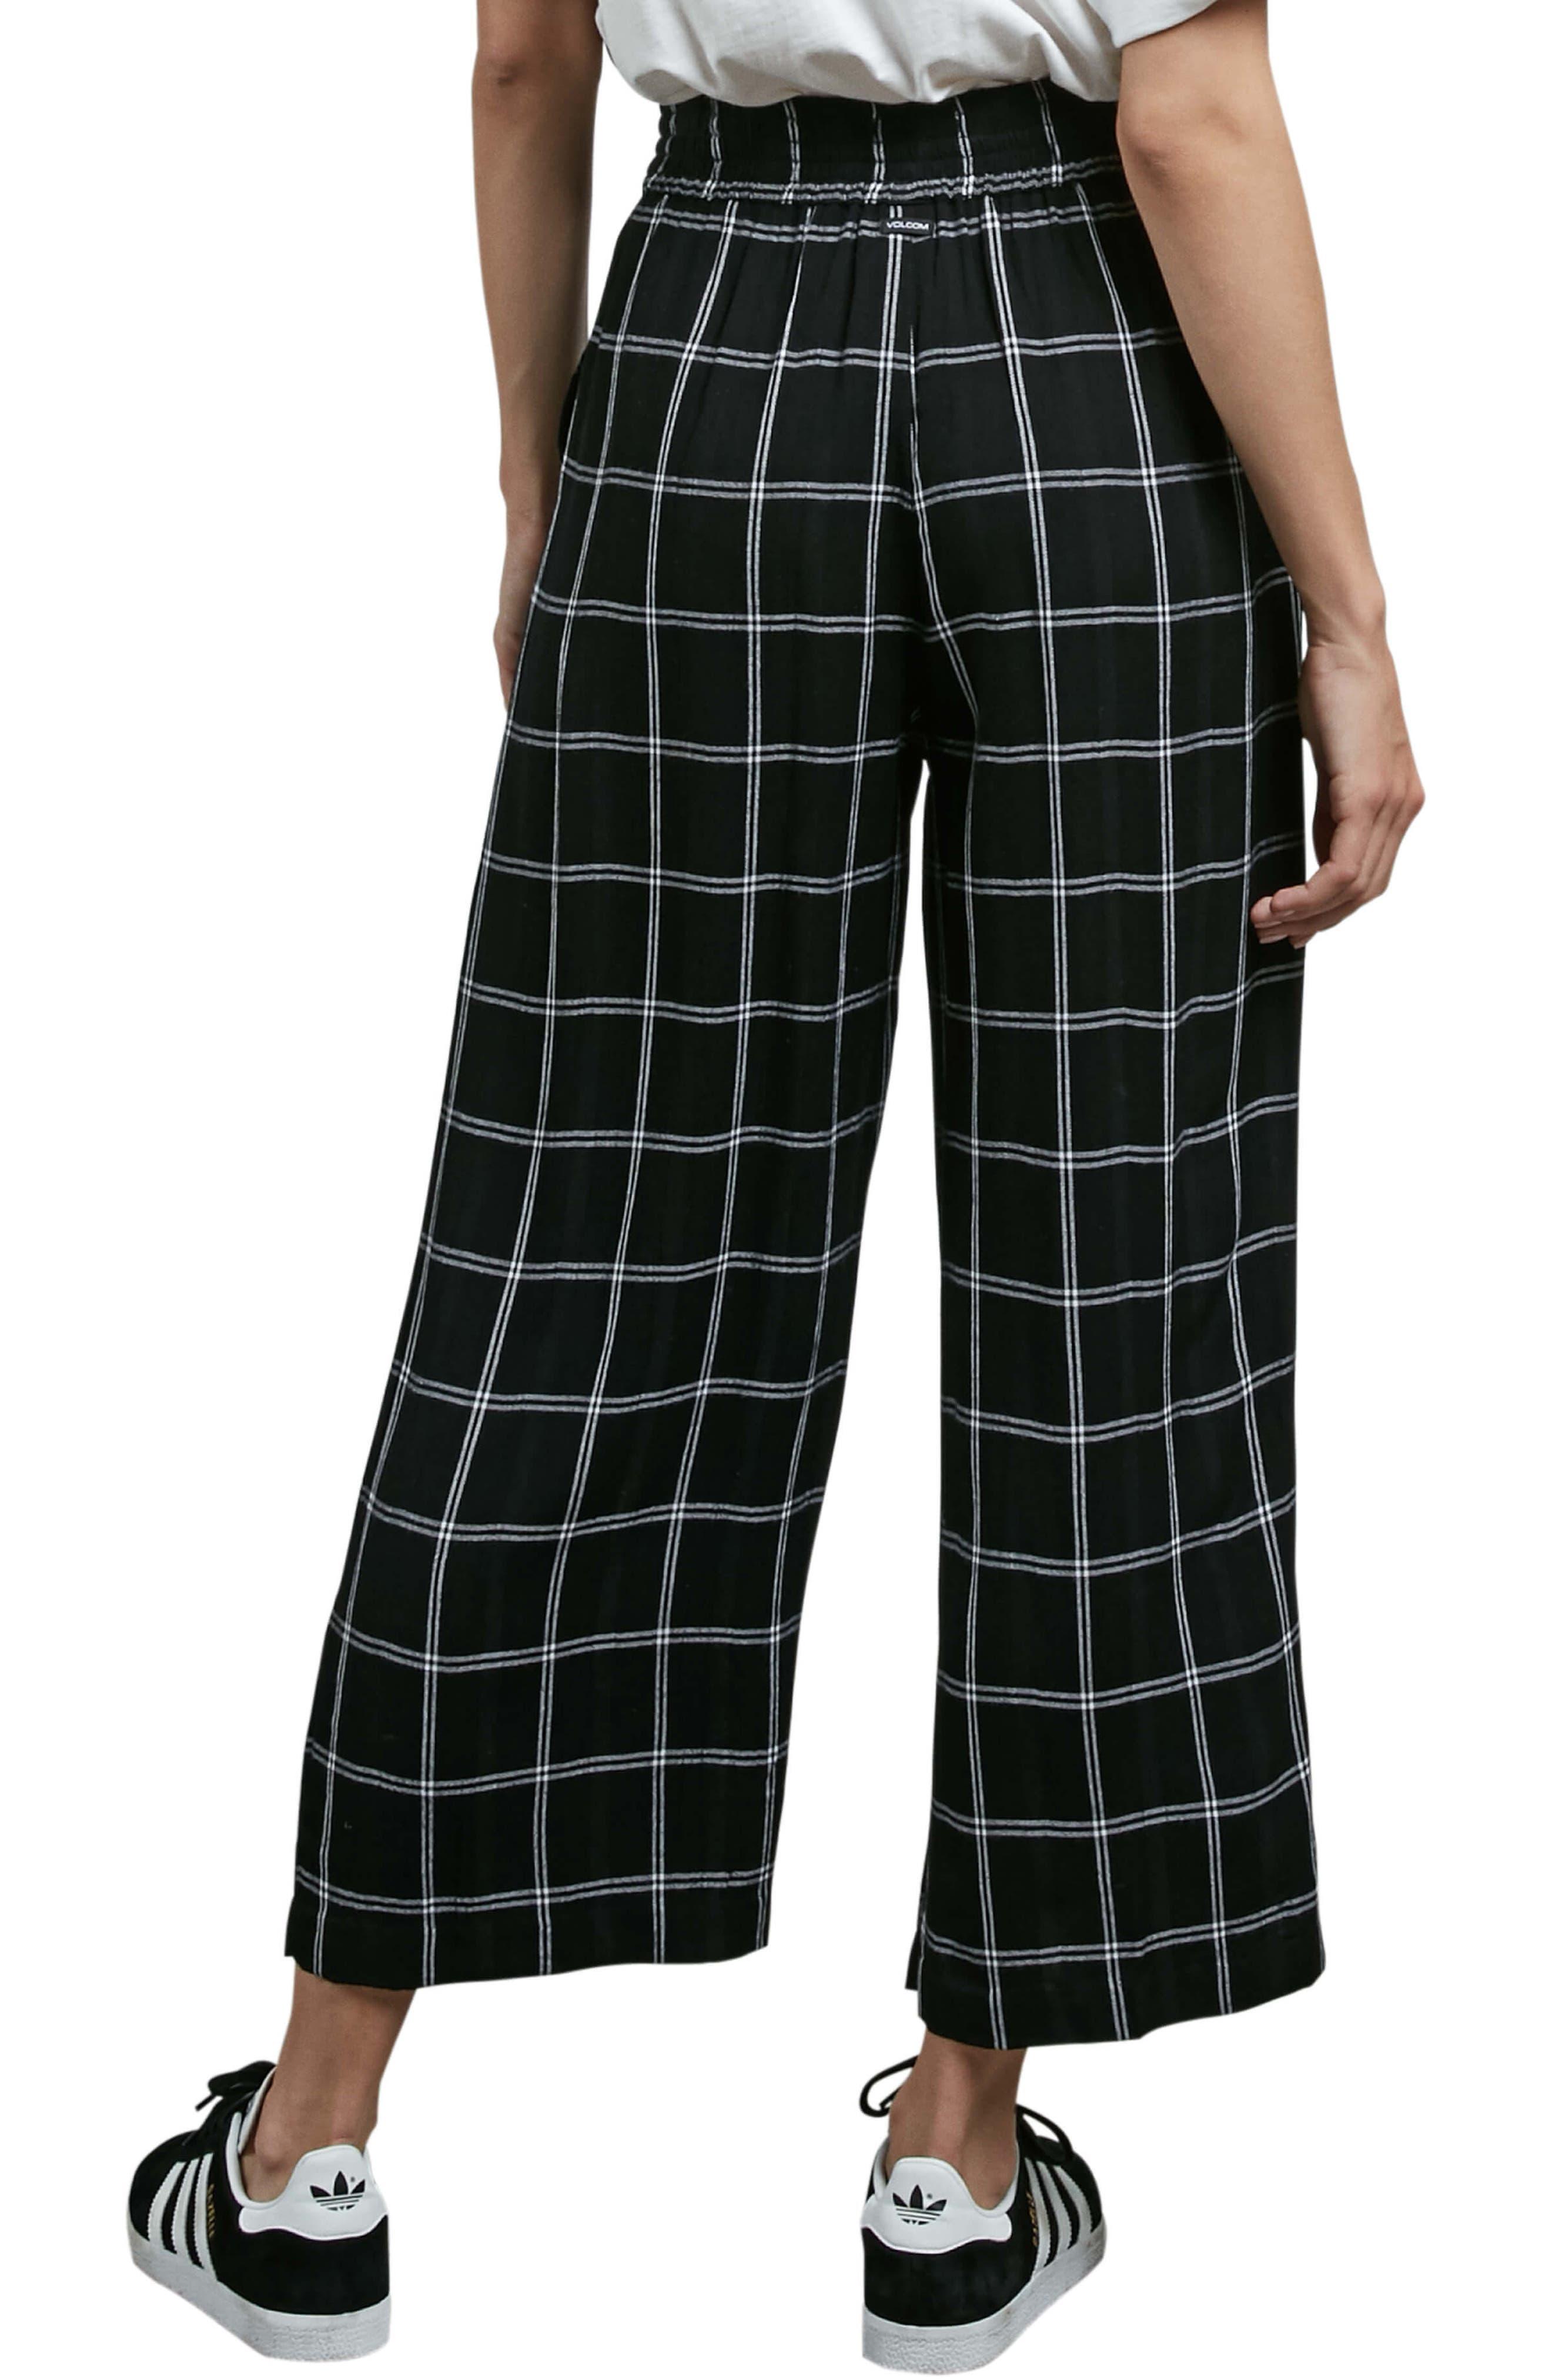 Jumponit Windowpane Crop Pants,                             Alternate thumbnail 2, color,                             Black